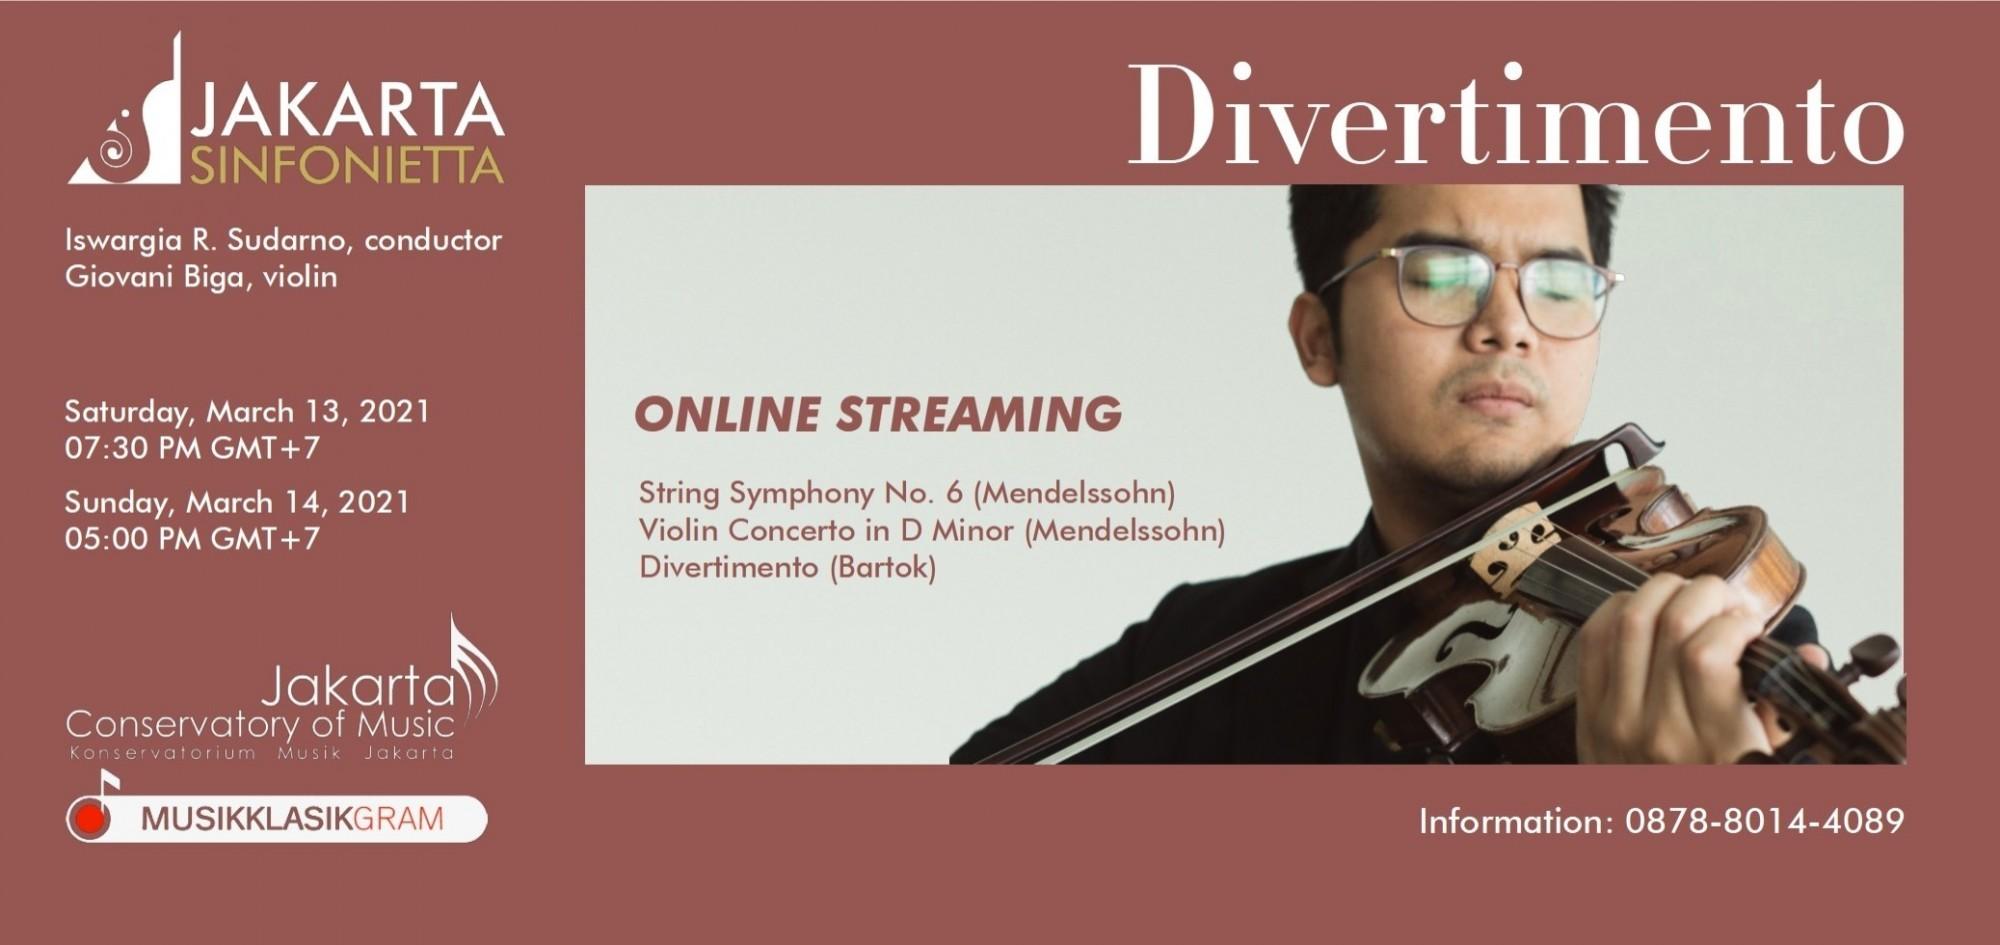 Jakarta Sinfonietta & Giovani Biga - Divertimento (14 March 2021)